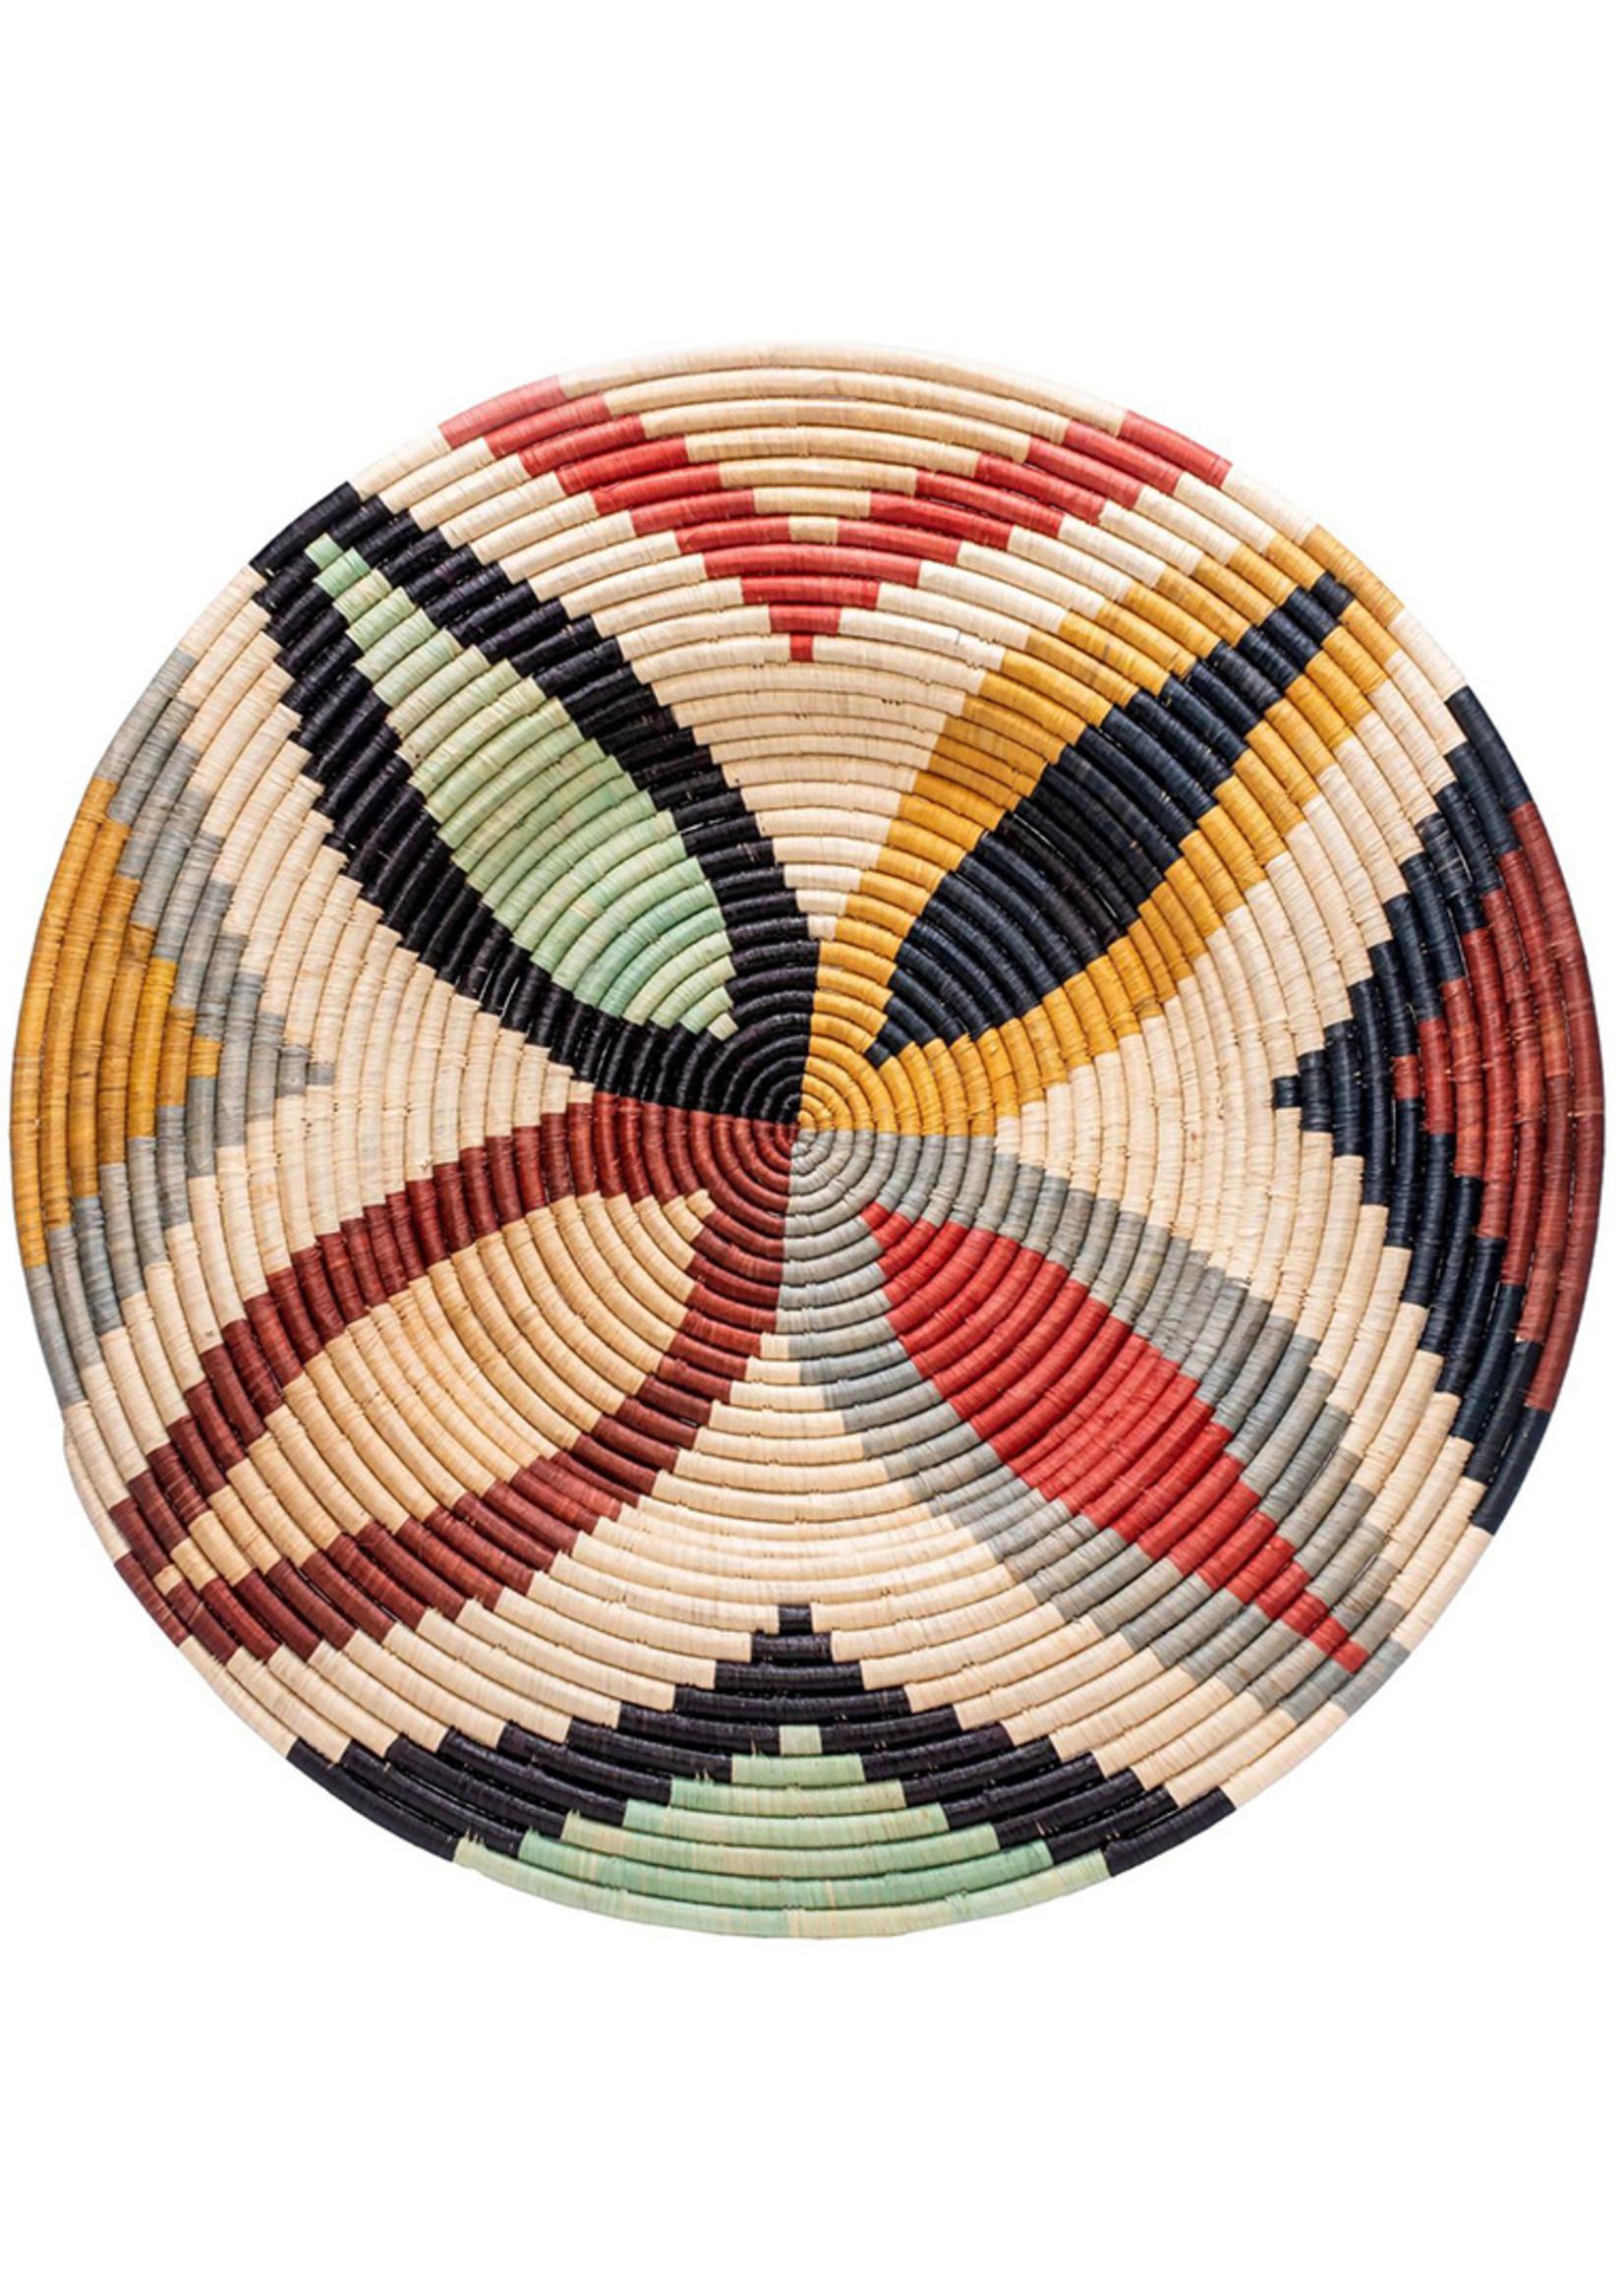 "Kazi 27"" Mod Annette Wall Plate"